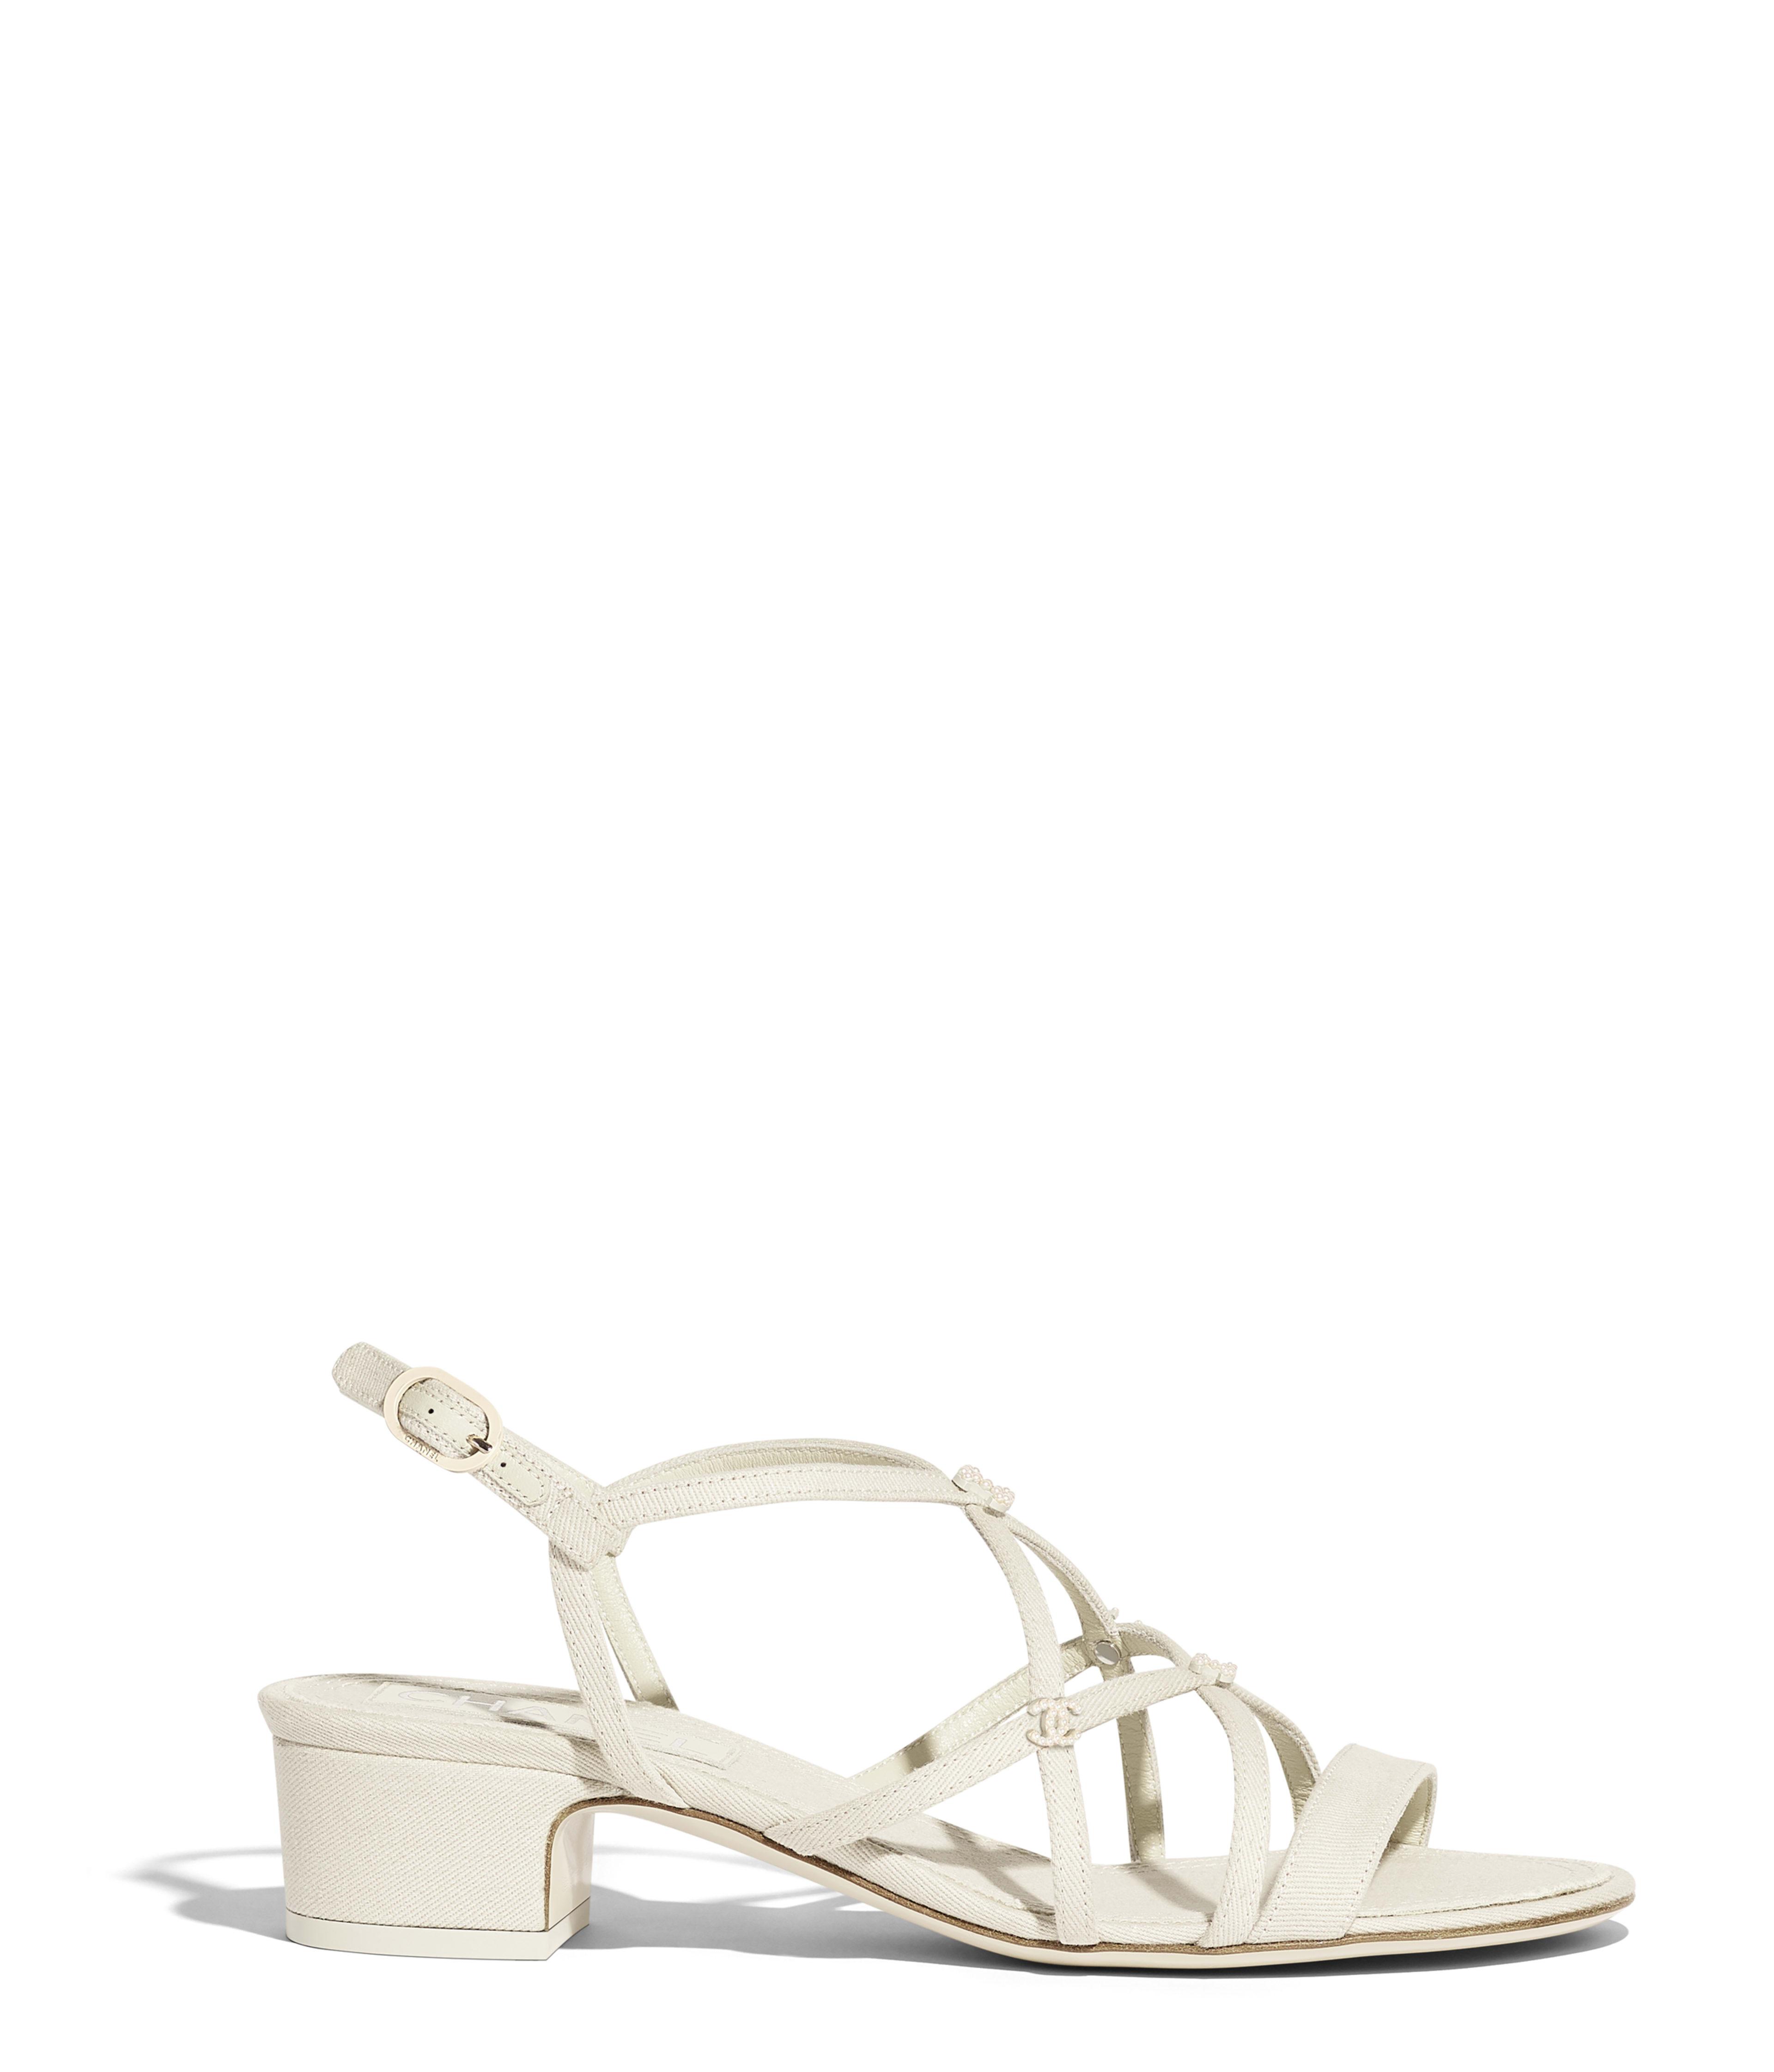 ca526797679 Sandals - Shoes